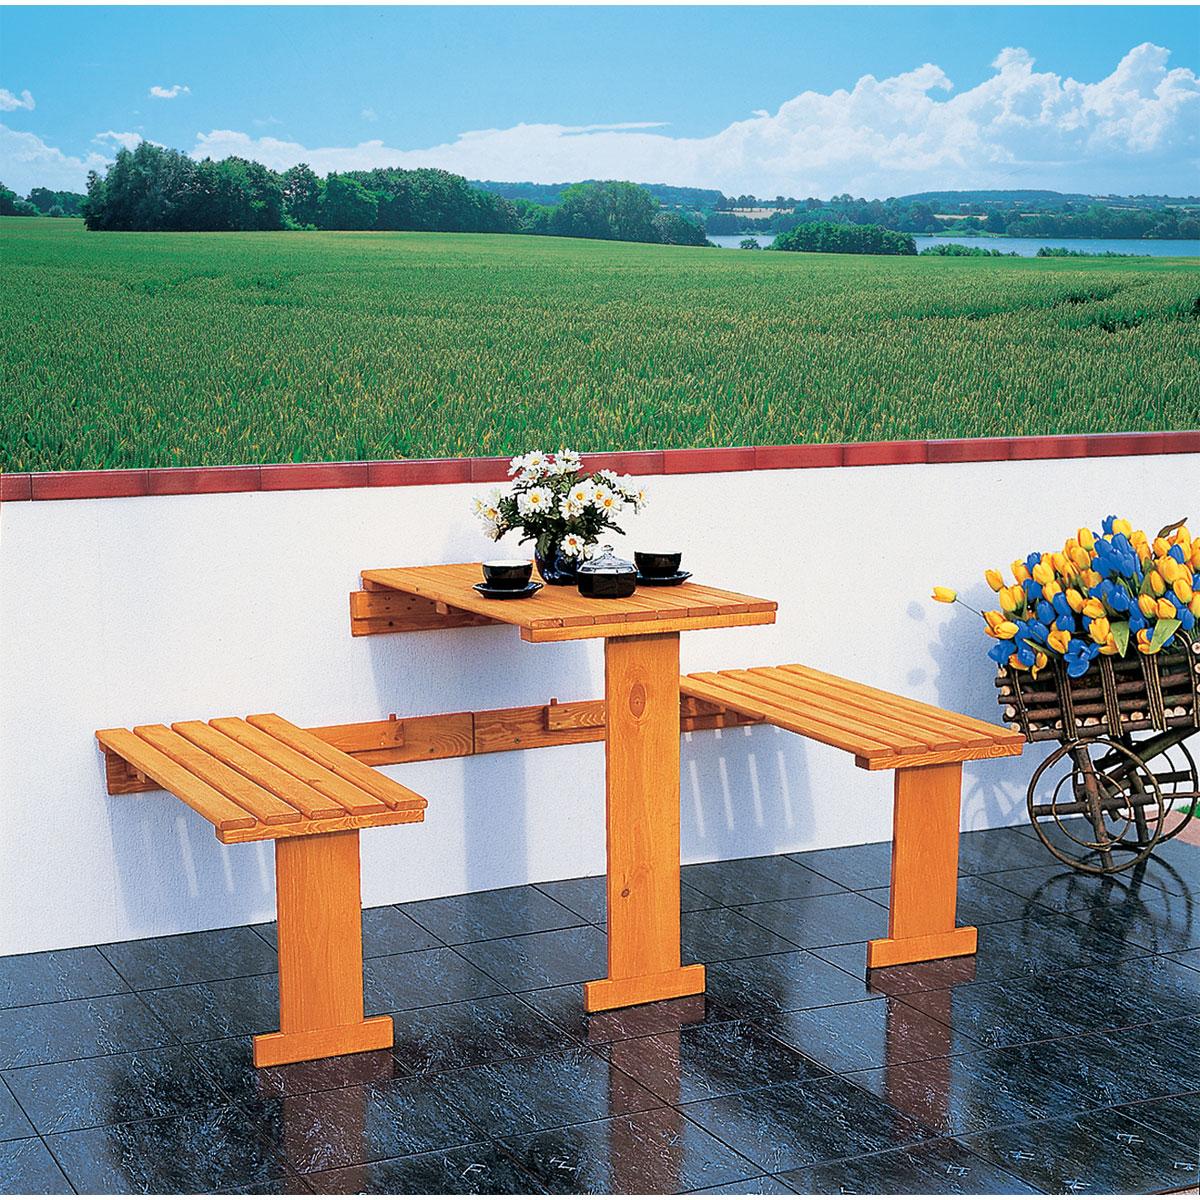 Gartenmöbel Sets - Balkonklappgarnitur  - Onlineshop Hellweg